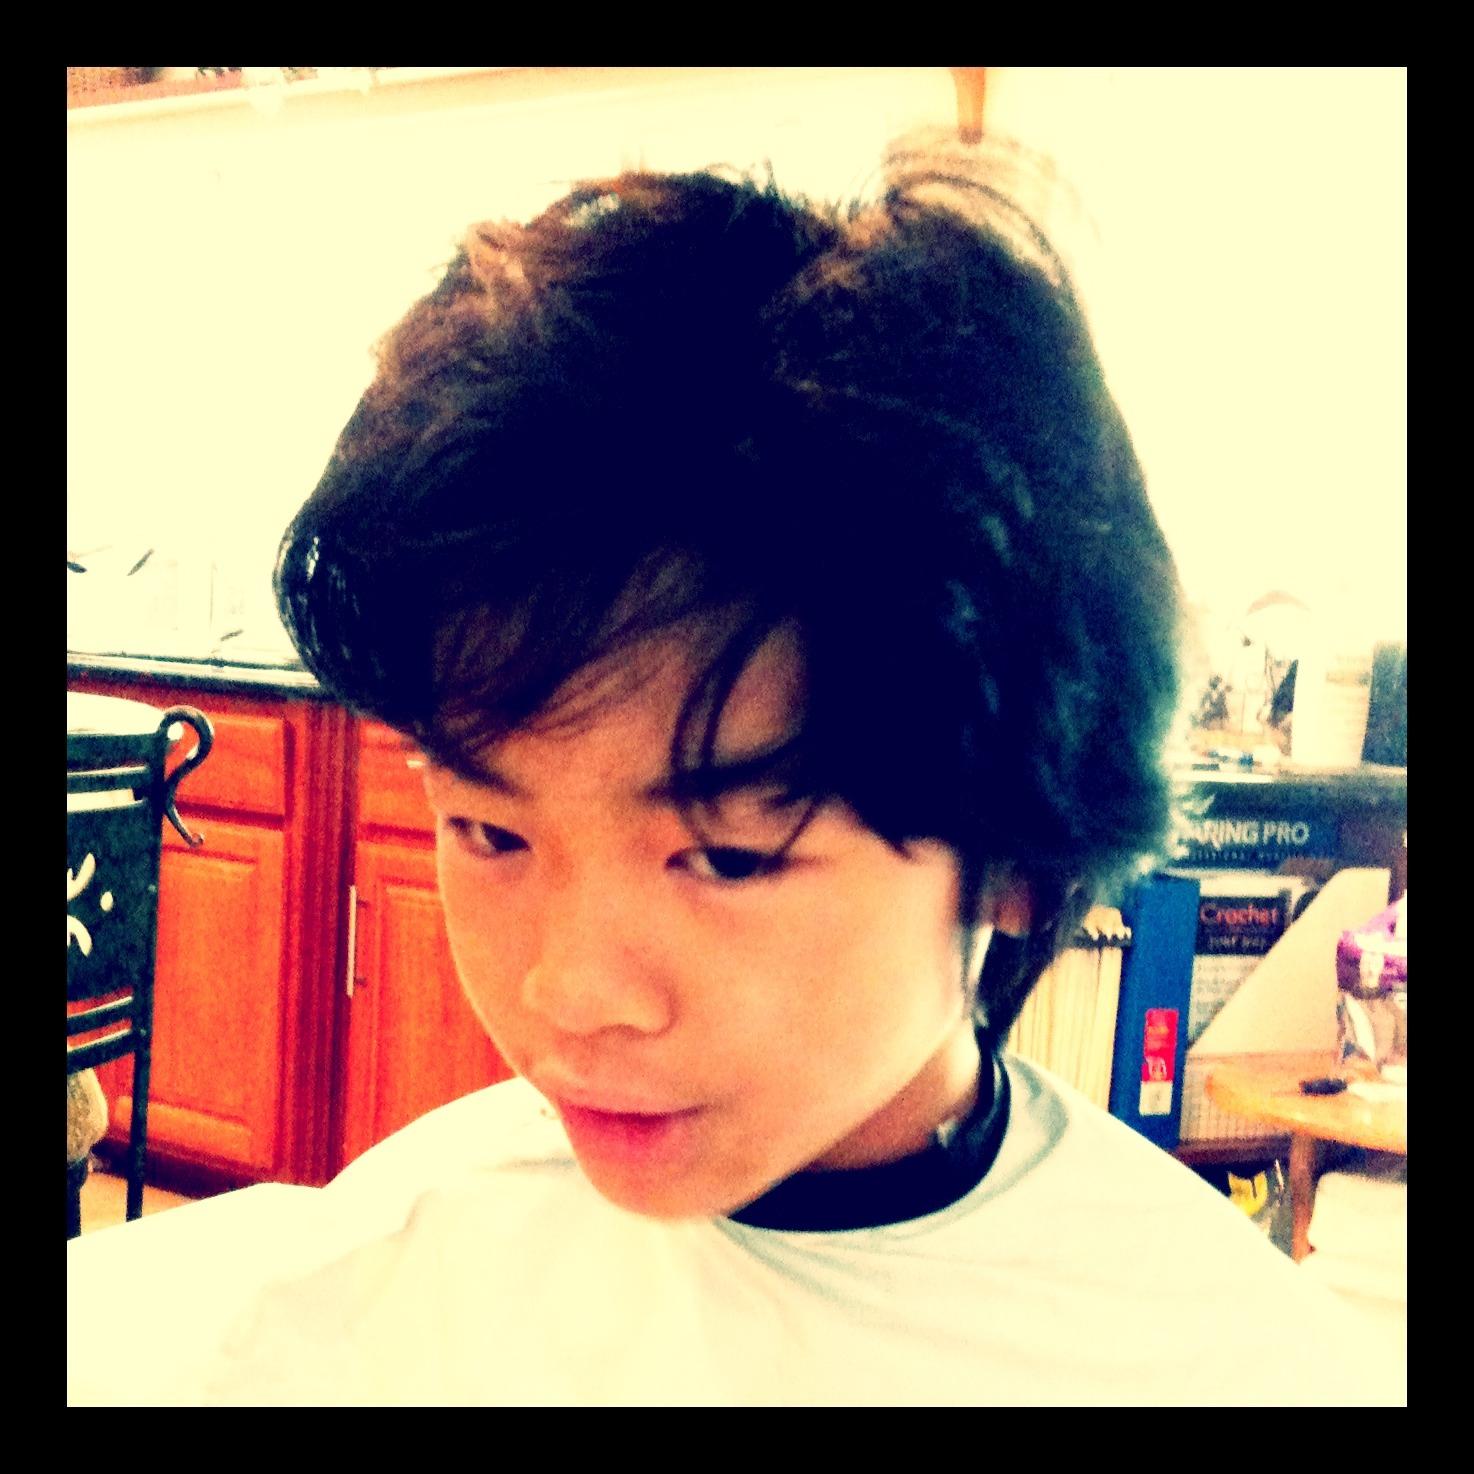 Haircut for the boy.